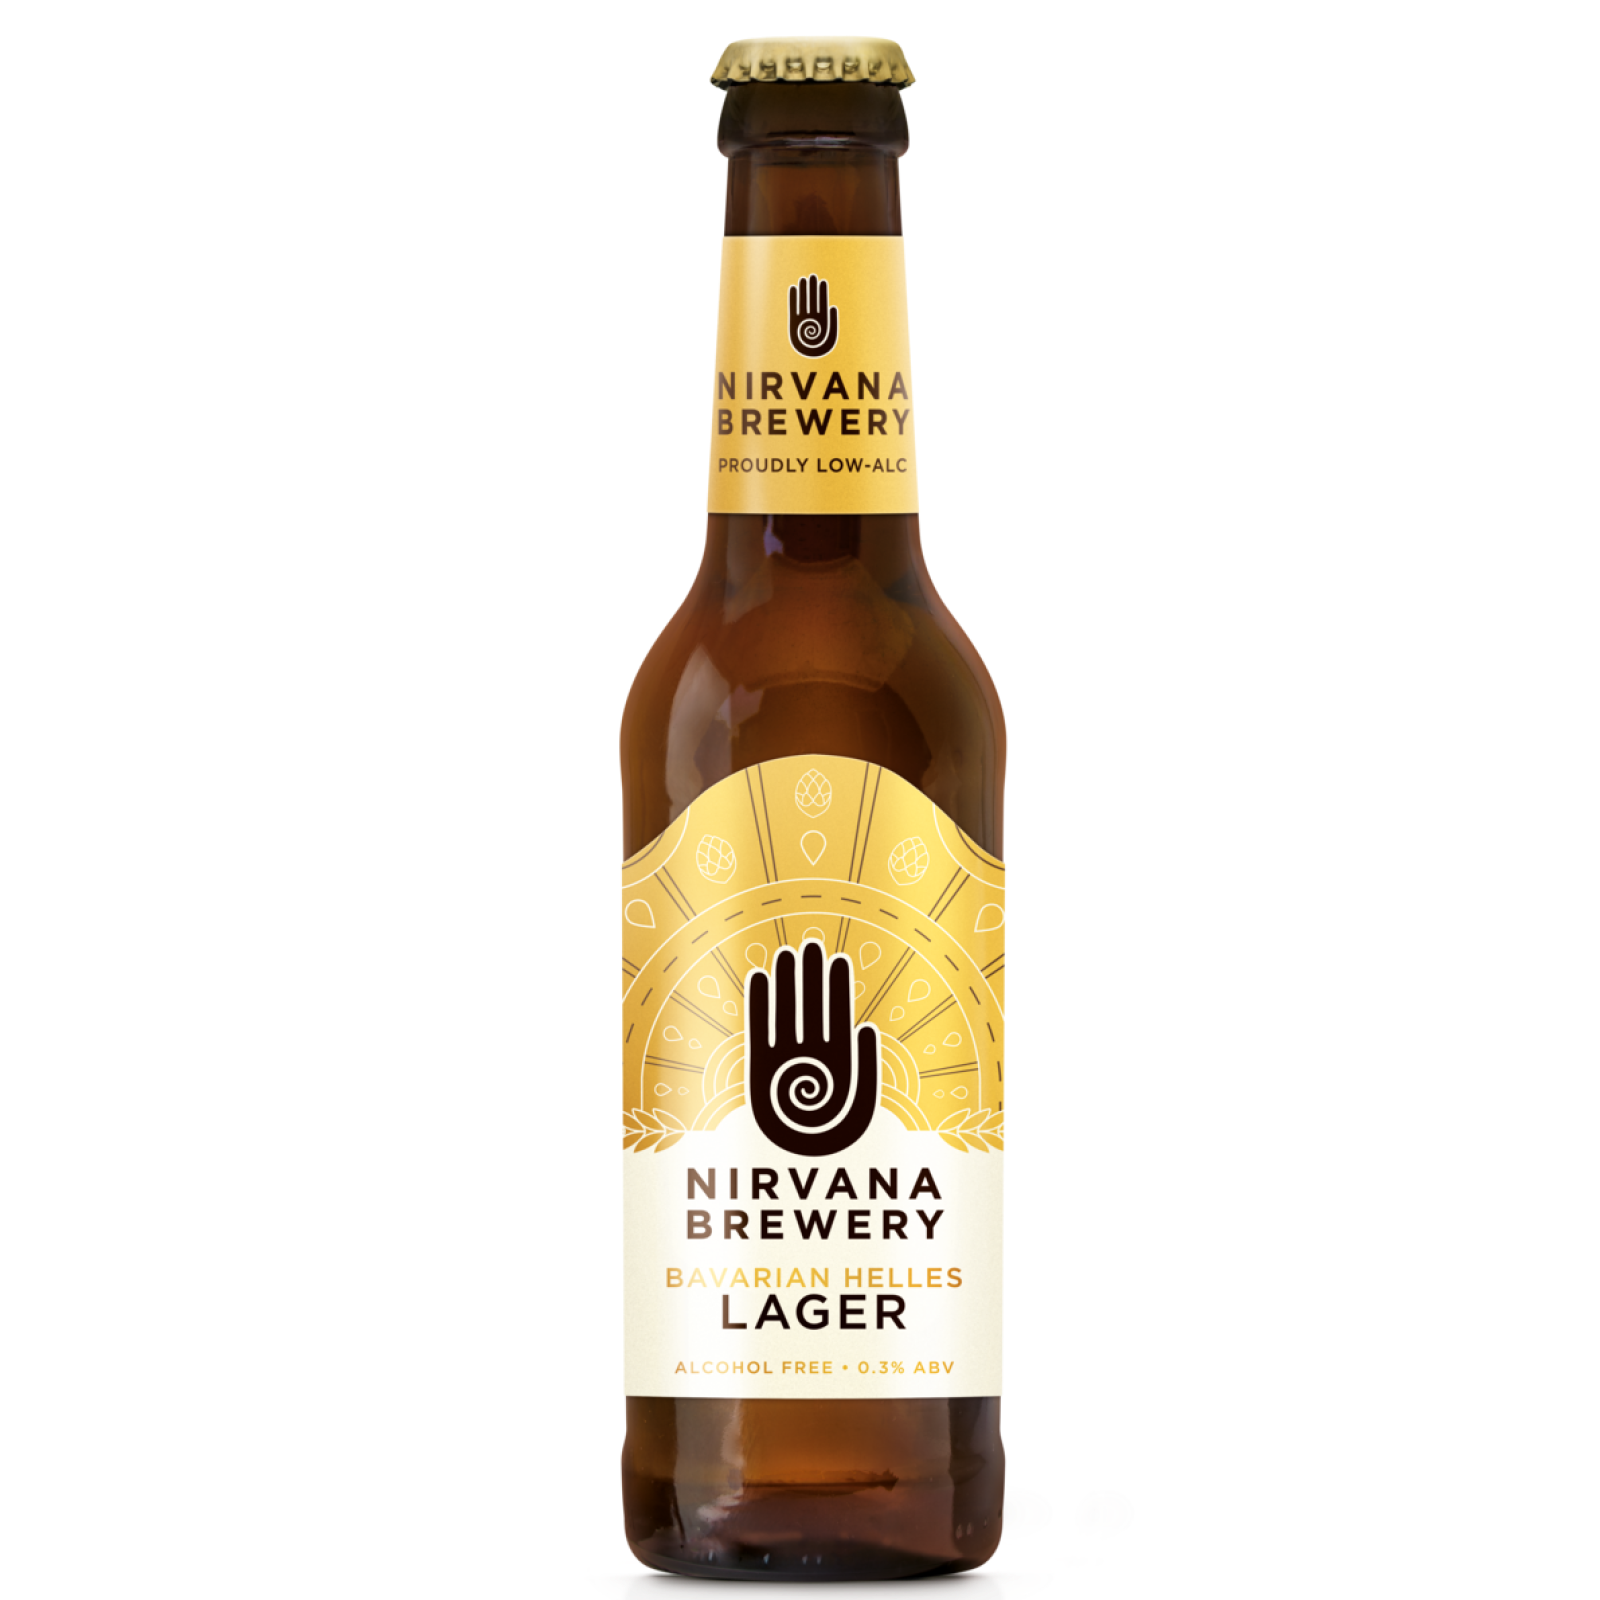 Bavarian Helles Lager 0.3% 330ml Nirvana Brewery